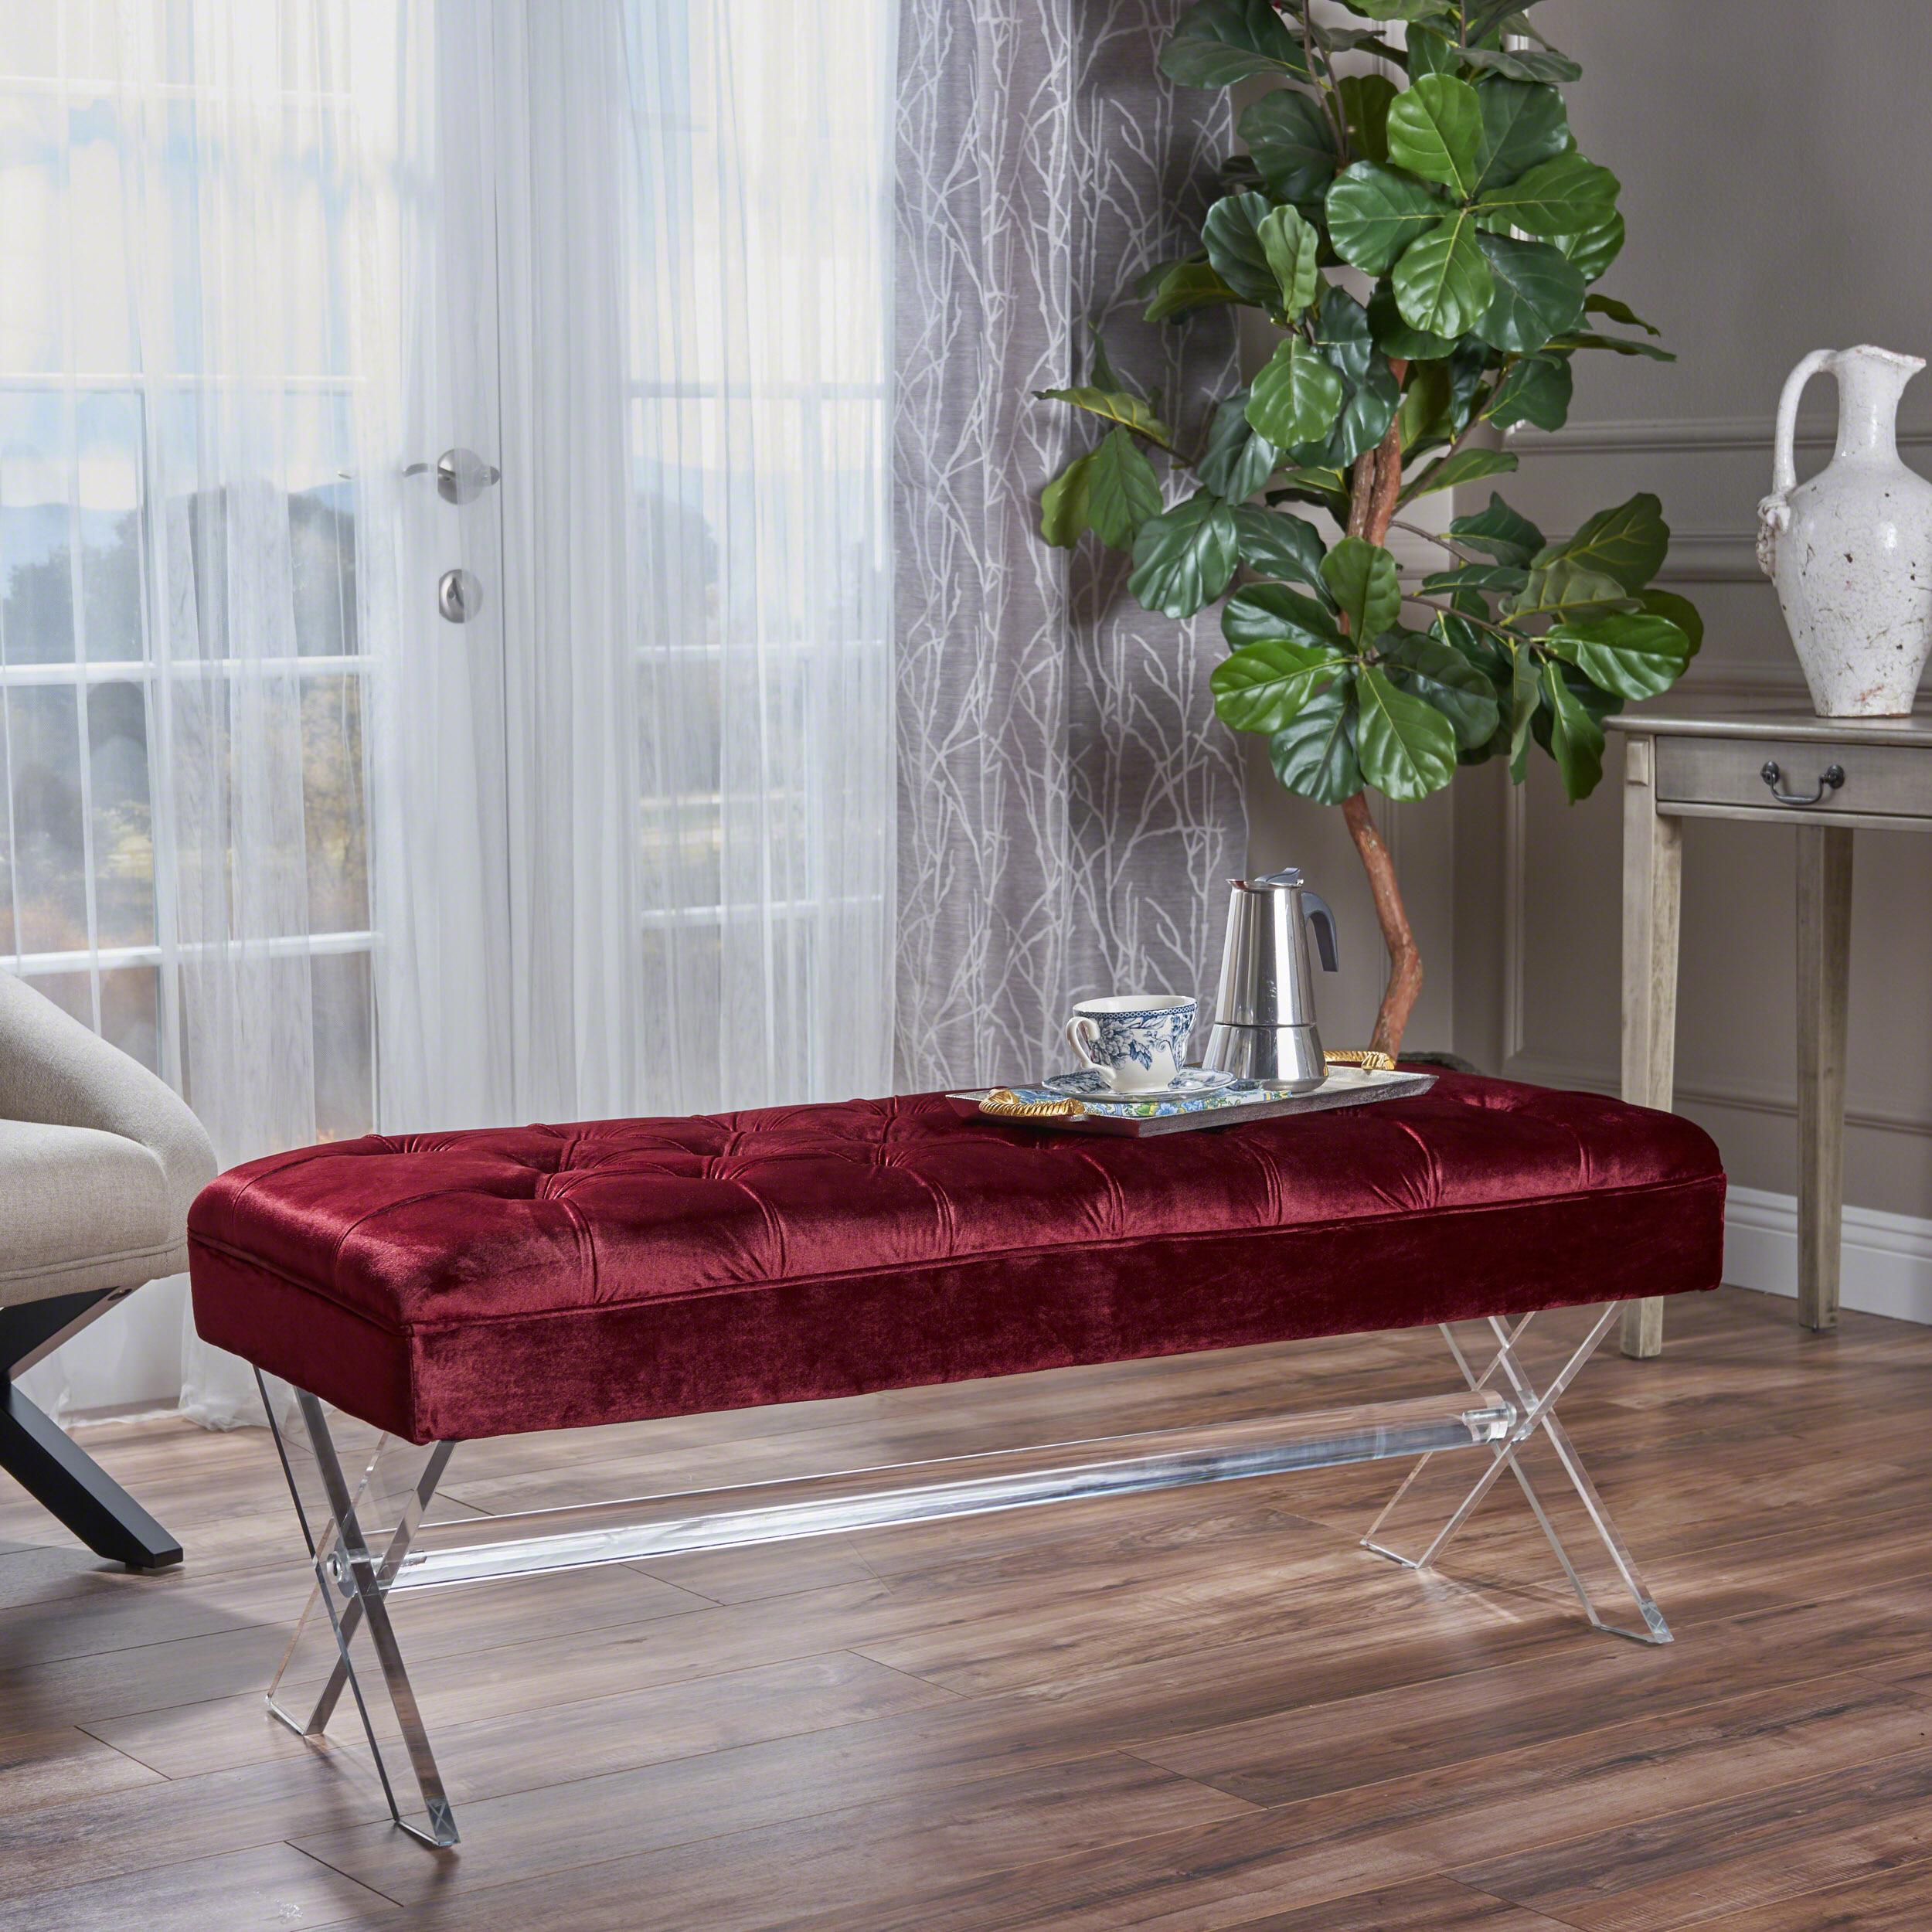 Noble House Dominique Tufted Velvet Ottoman with Acrylic Legs, Garnet, Clear